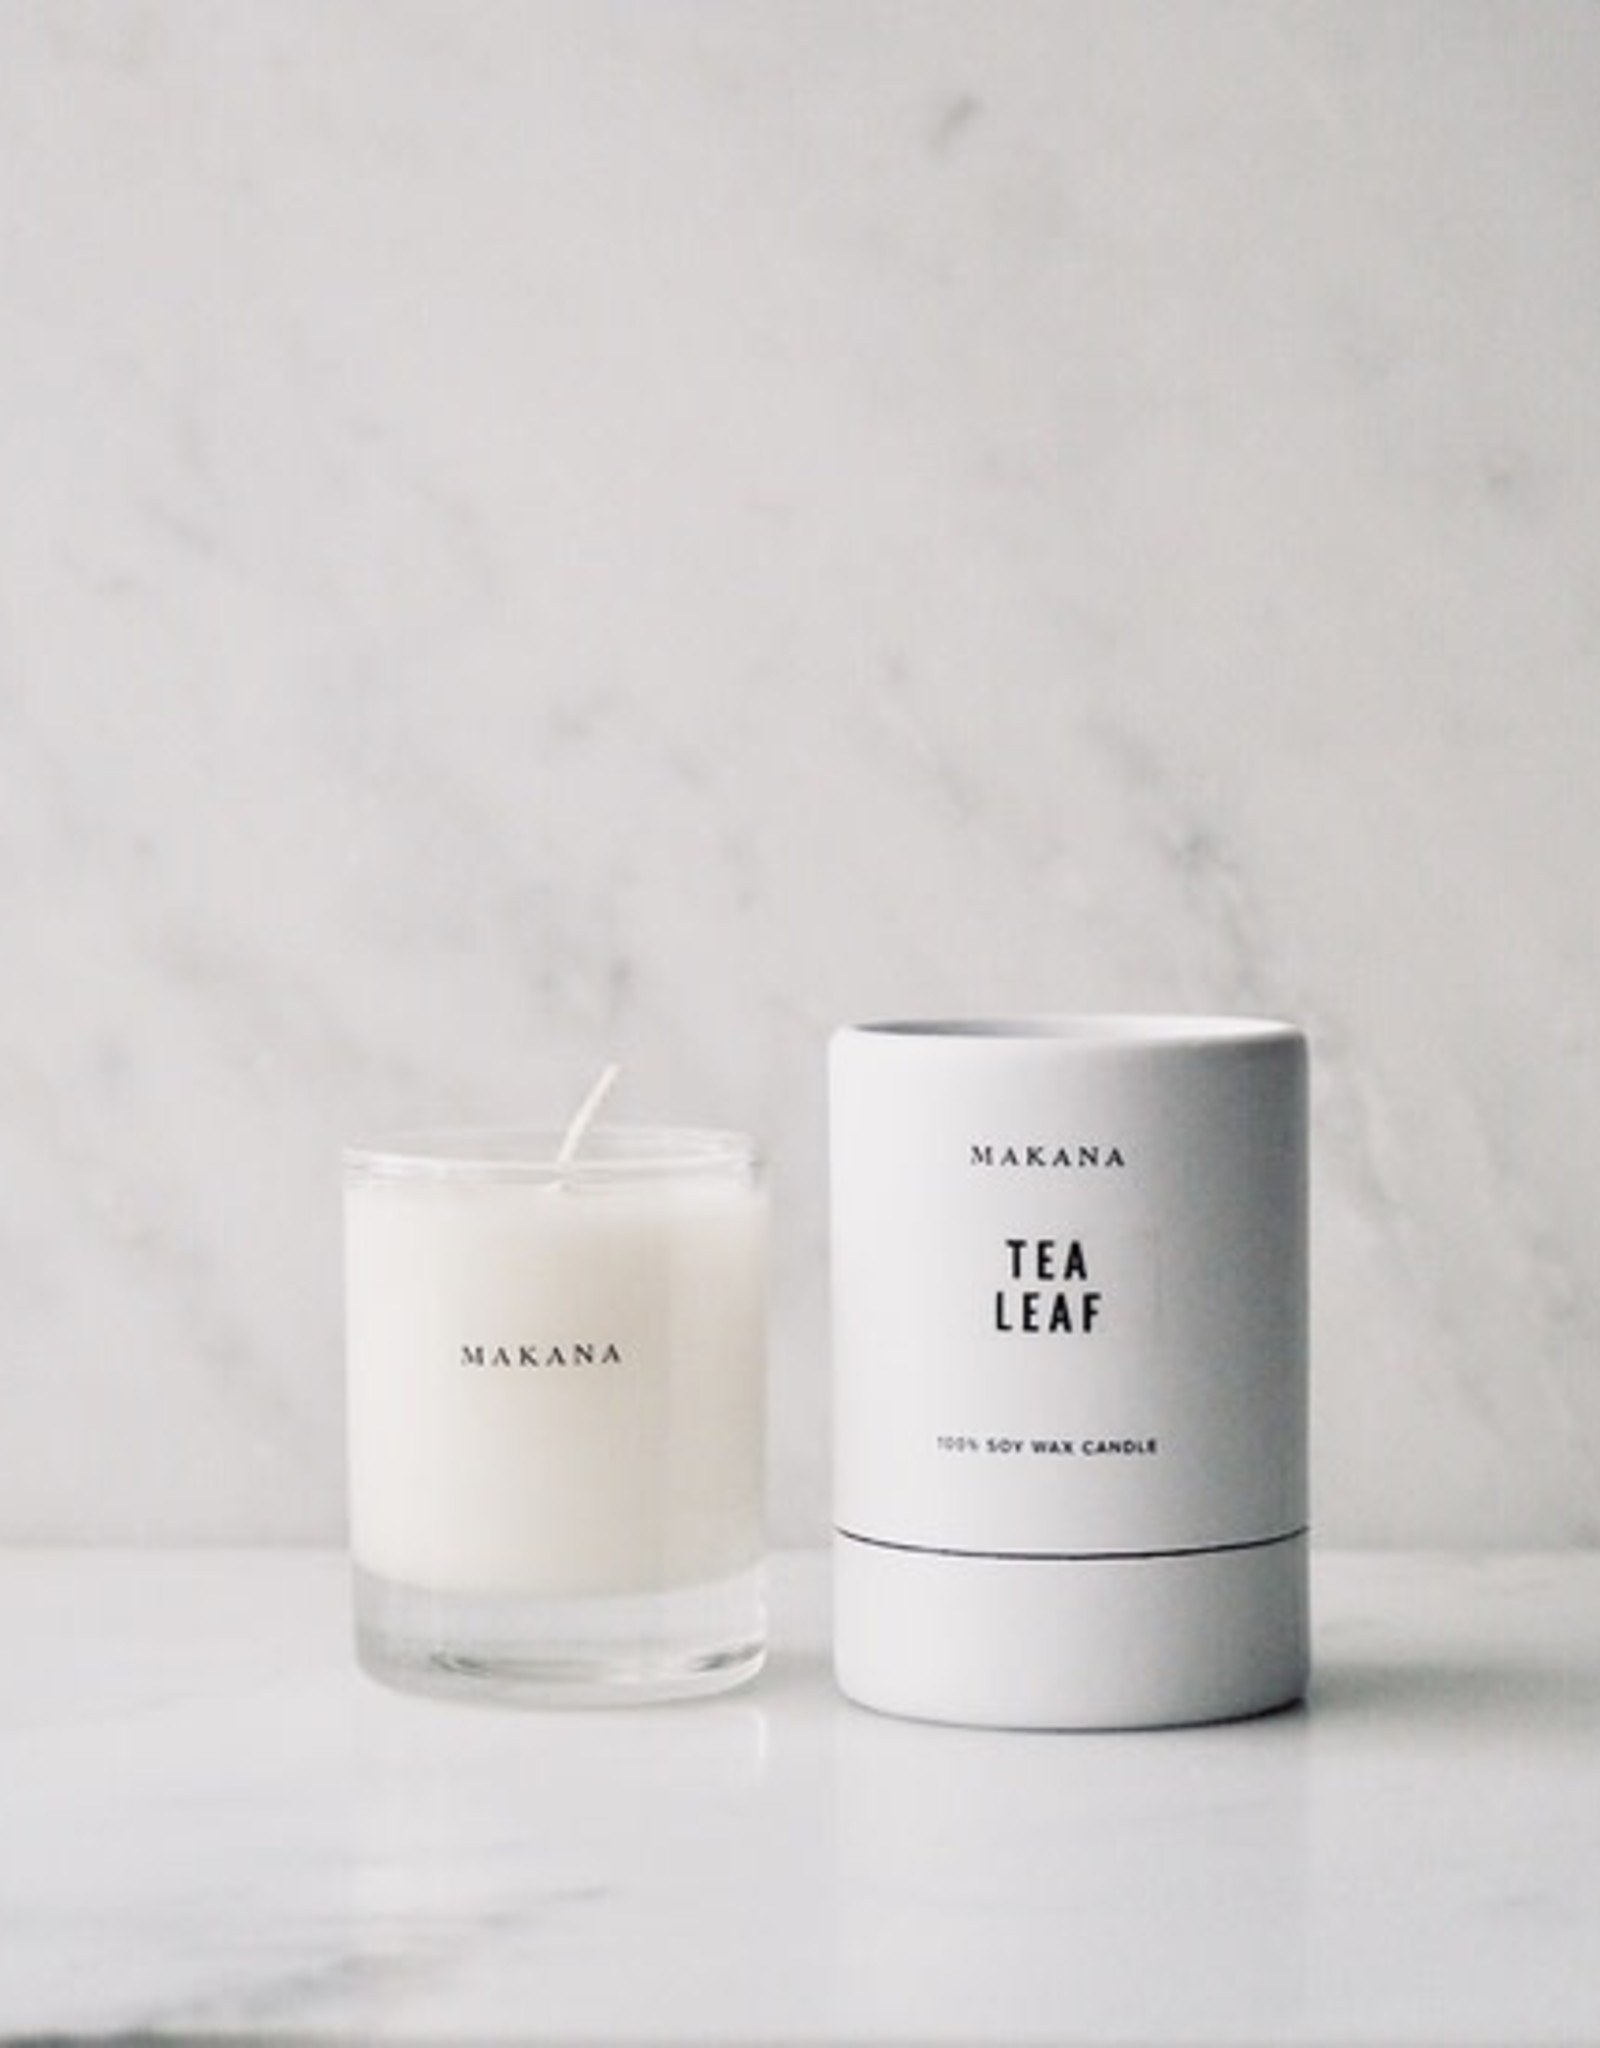 makana Tea Leaf - Petite Candle 3